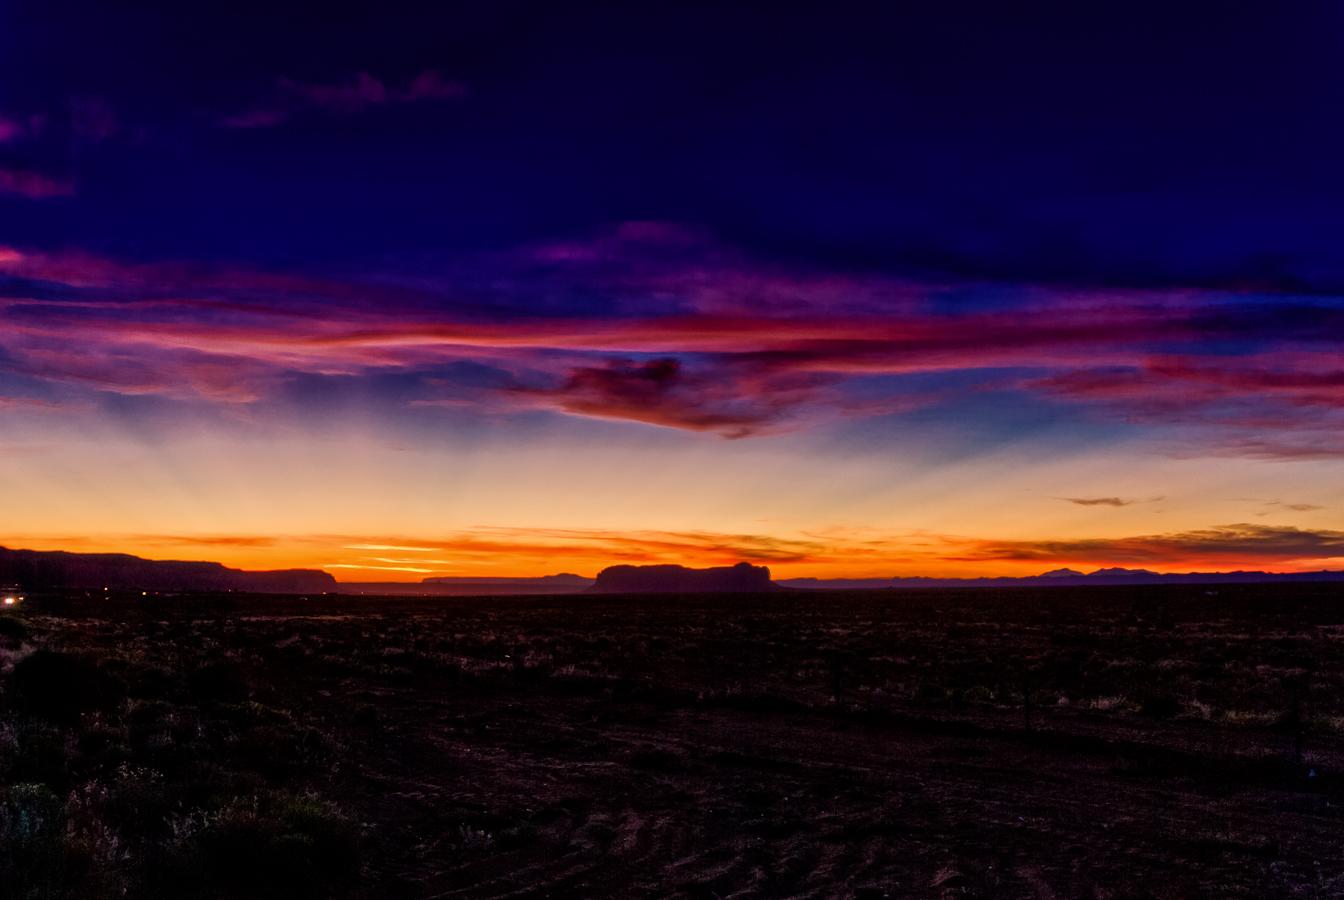 monument-valley-sunset-photo-